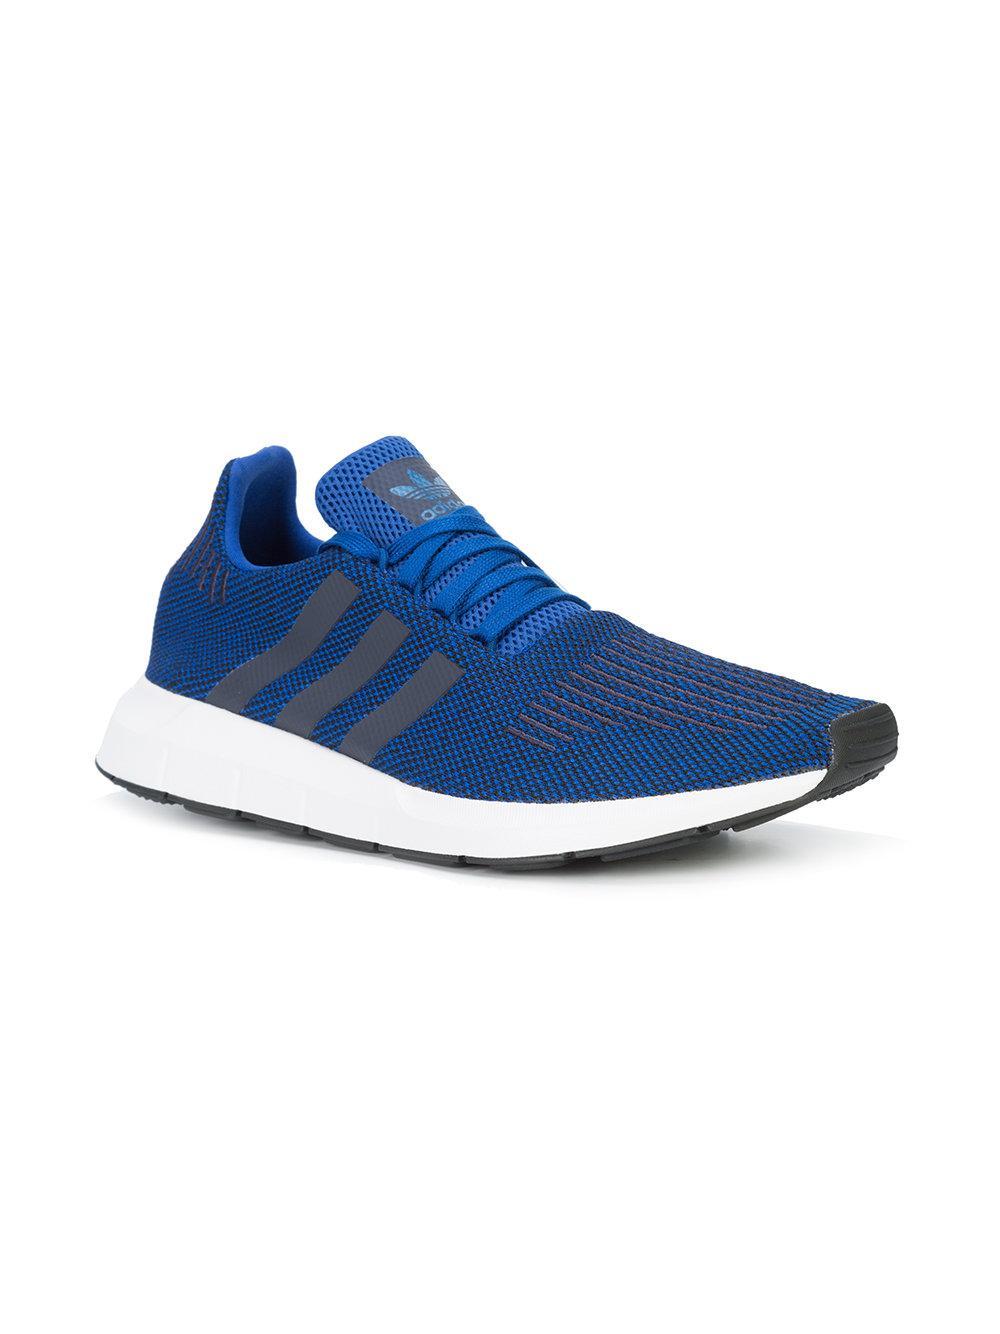 ae5d3ddf85cd2e Adidas Originals Swift Run Sneakers in Blue for Men